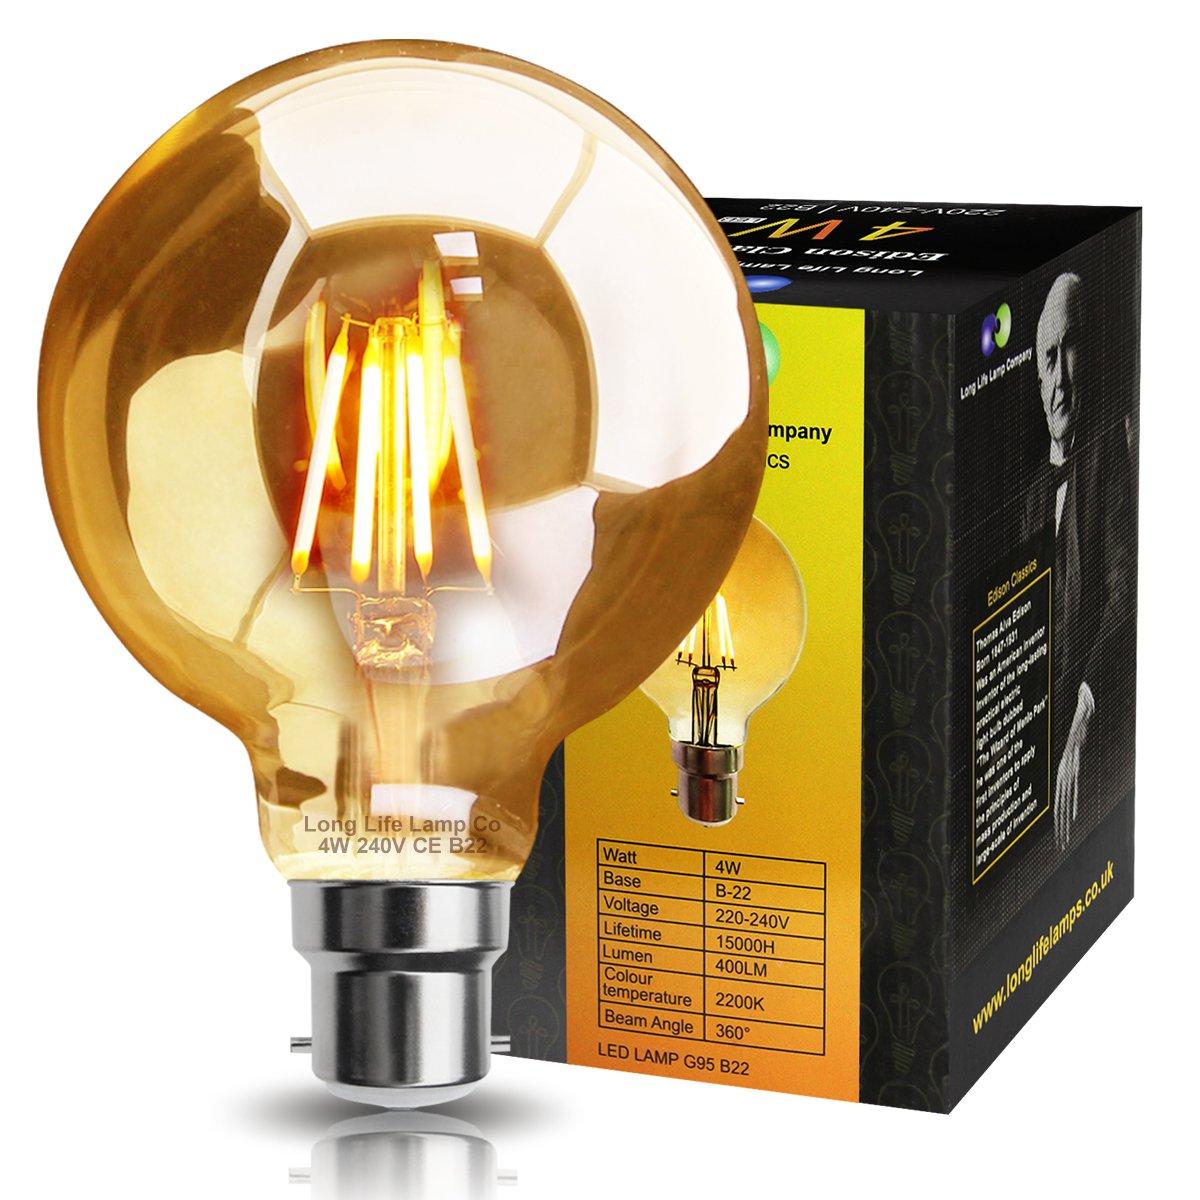 Vintage edison bulb old fashioned lamp classic a60 led 2w or 4w - Retro Vintage Led 4w Globe Edison Style Filament Bulb Smoked Gold Glass G95 B22 Bayonet Amazon Co Uk Lighting